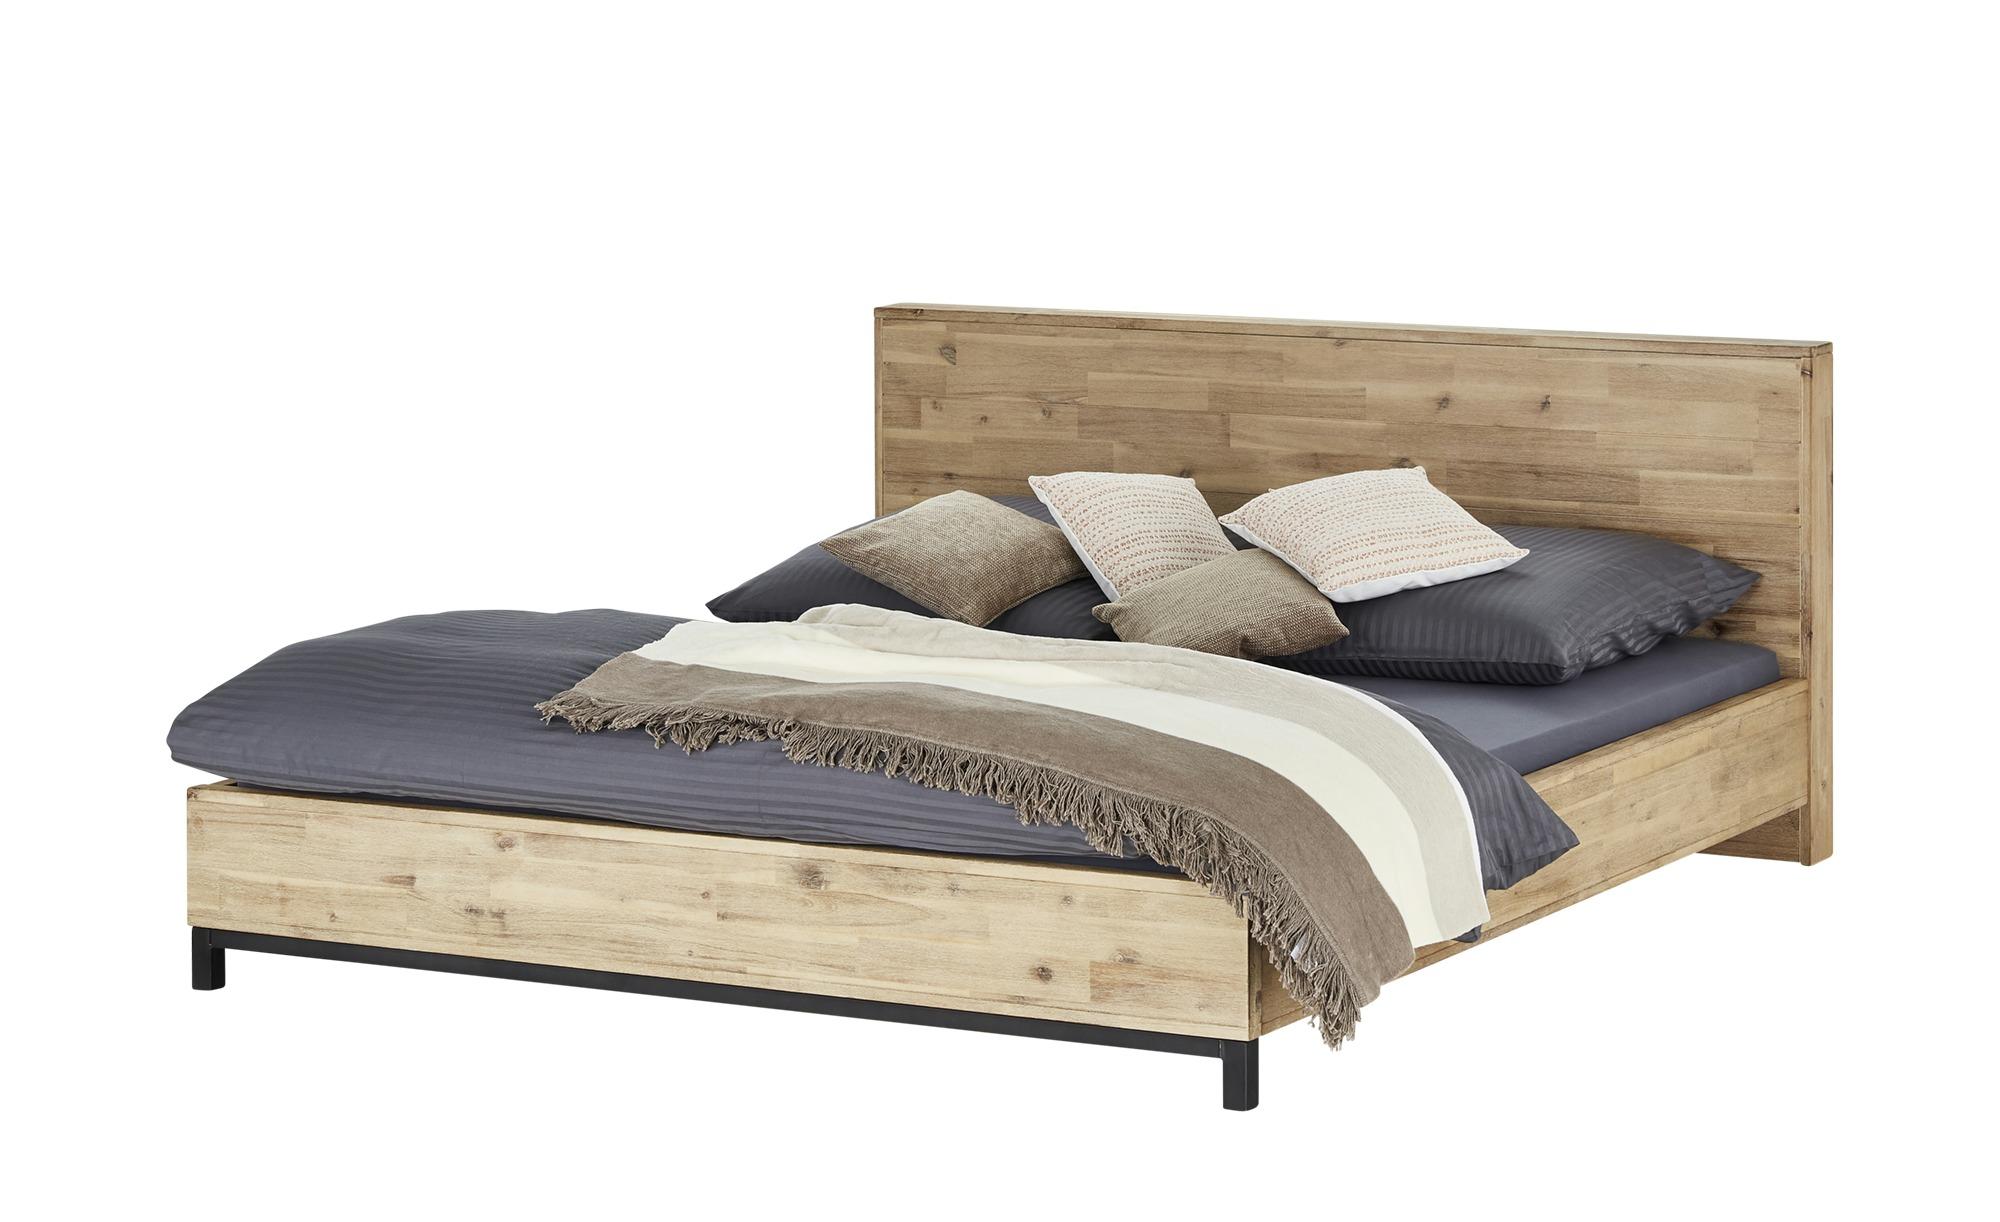 Akazienholz Holz Metall Doppelbetten Online Kaufen Mobel